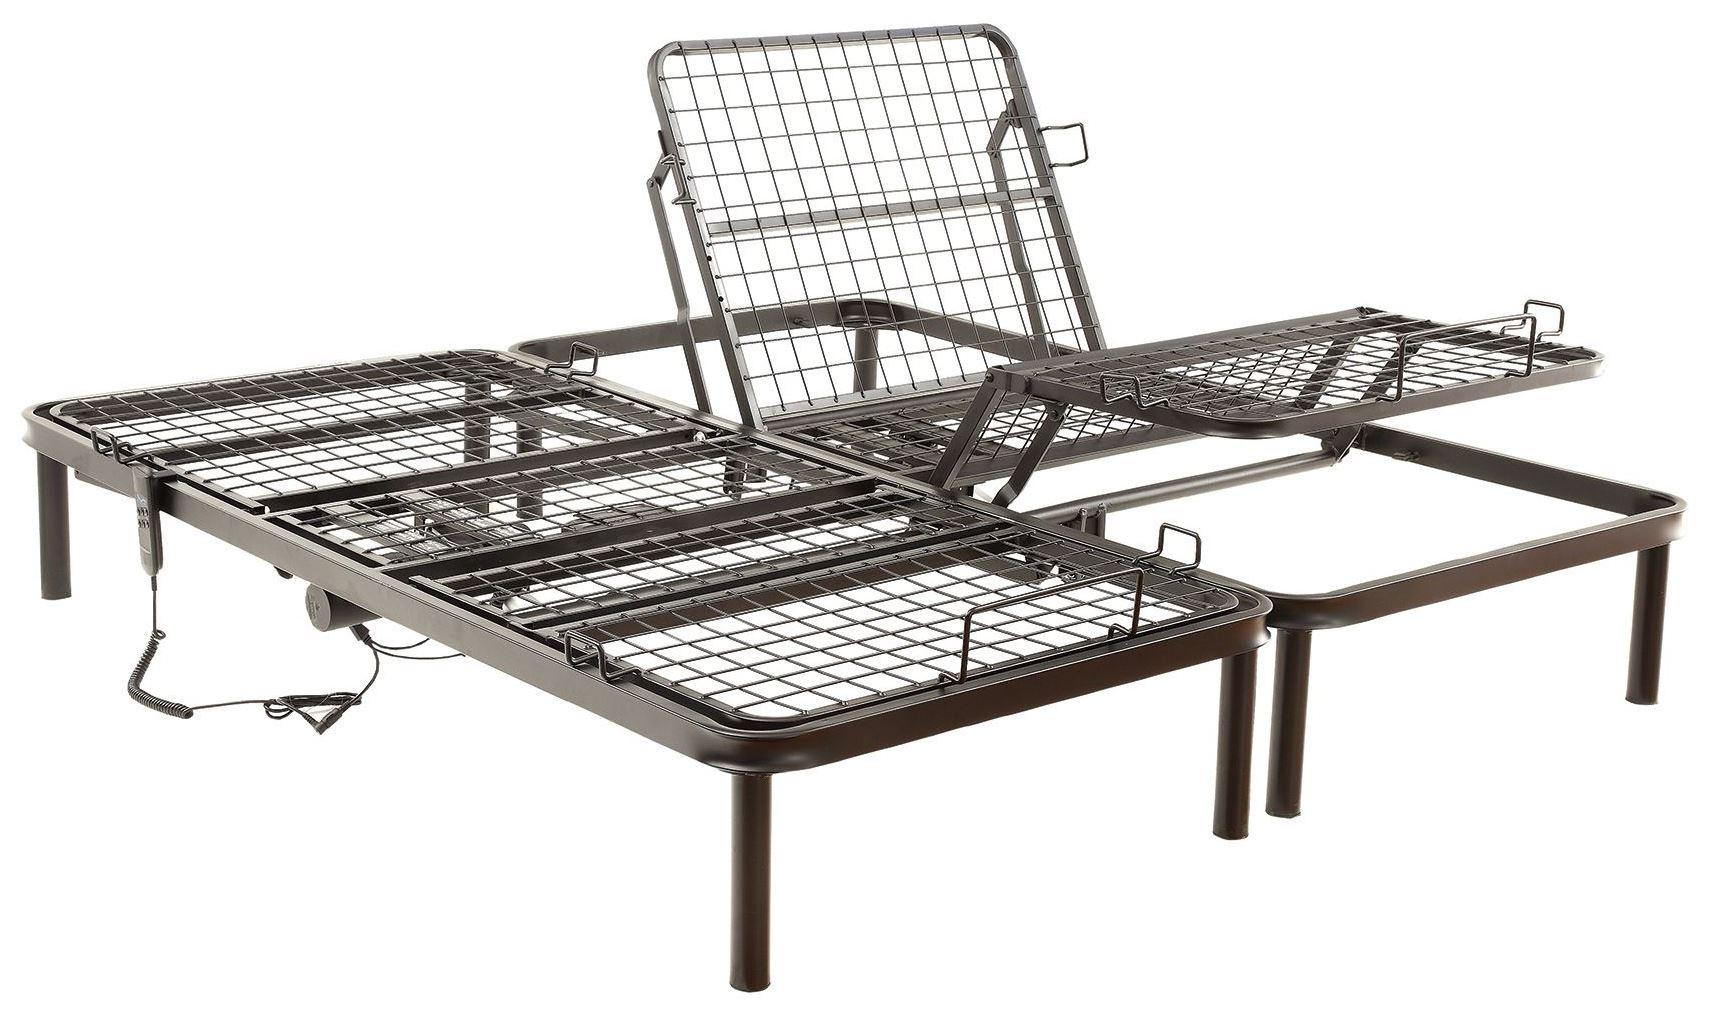 Queen Size Electric Adjustable Bed Frame : Queen electric adjustable bed from coaster q